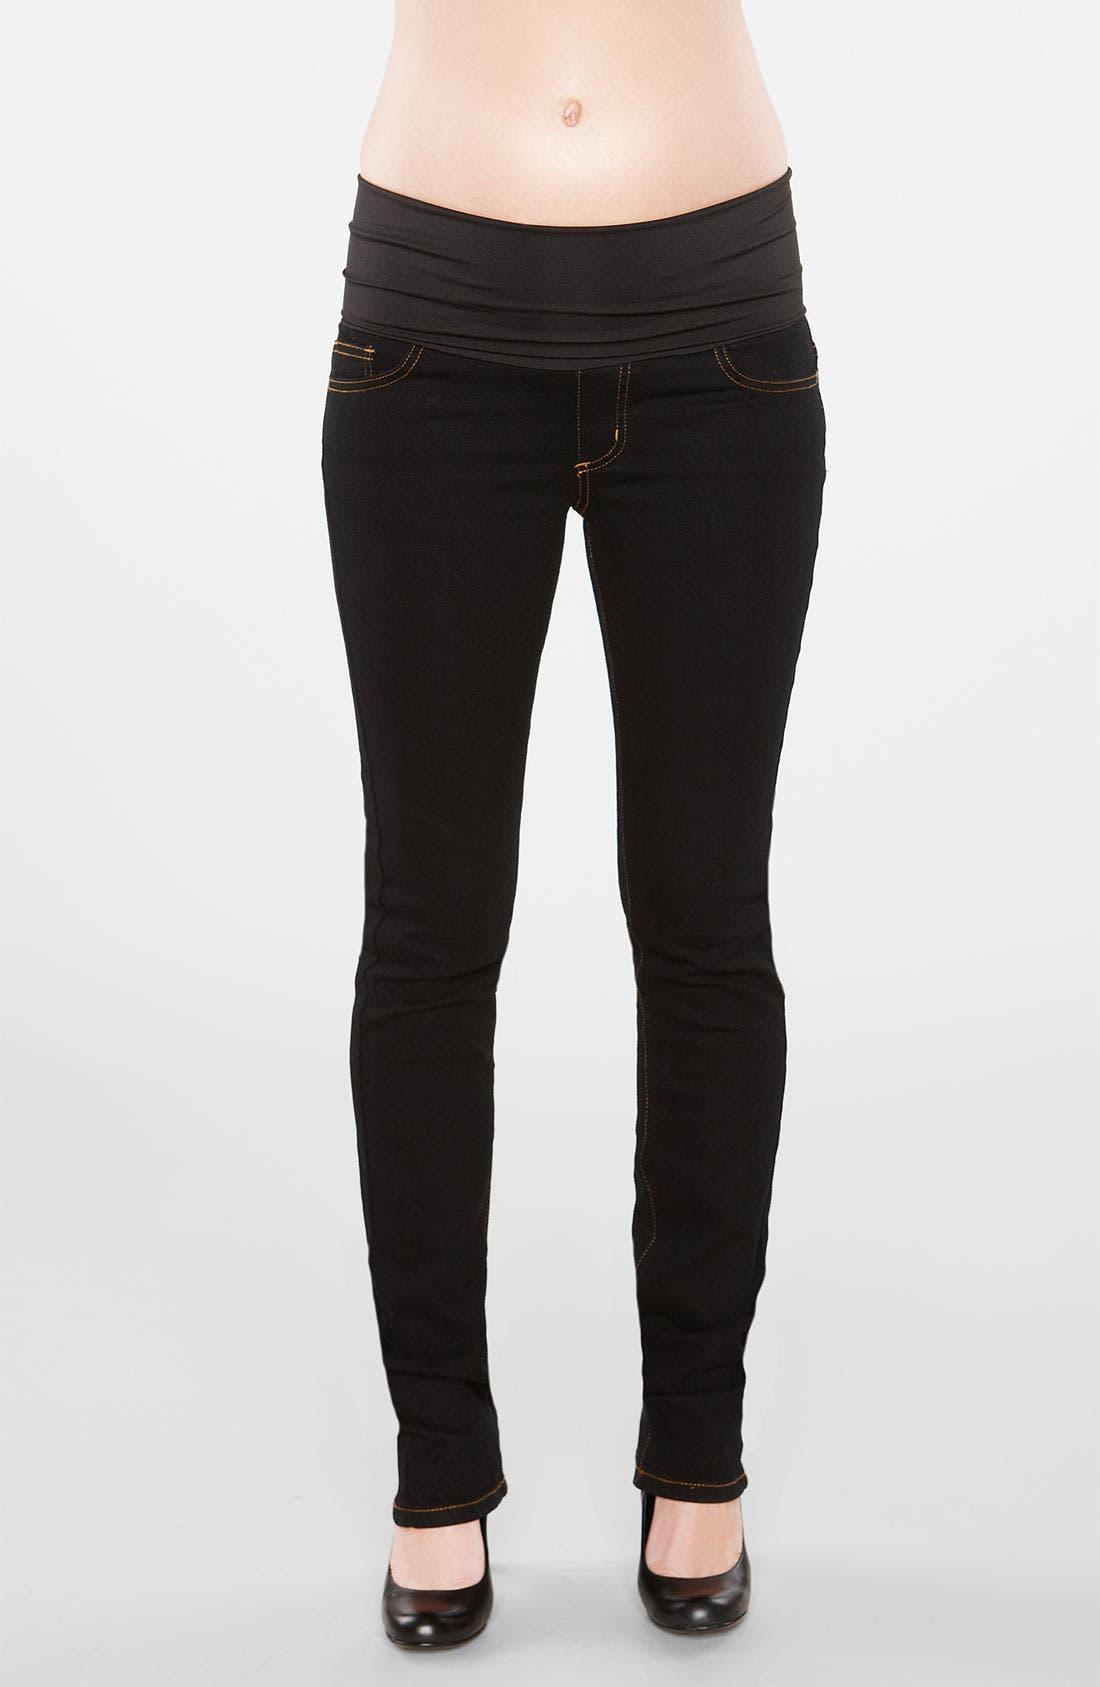 Straight Leg Stretch Maternity Jeans,                             Main thumbnail 1, color,                             BLACK